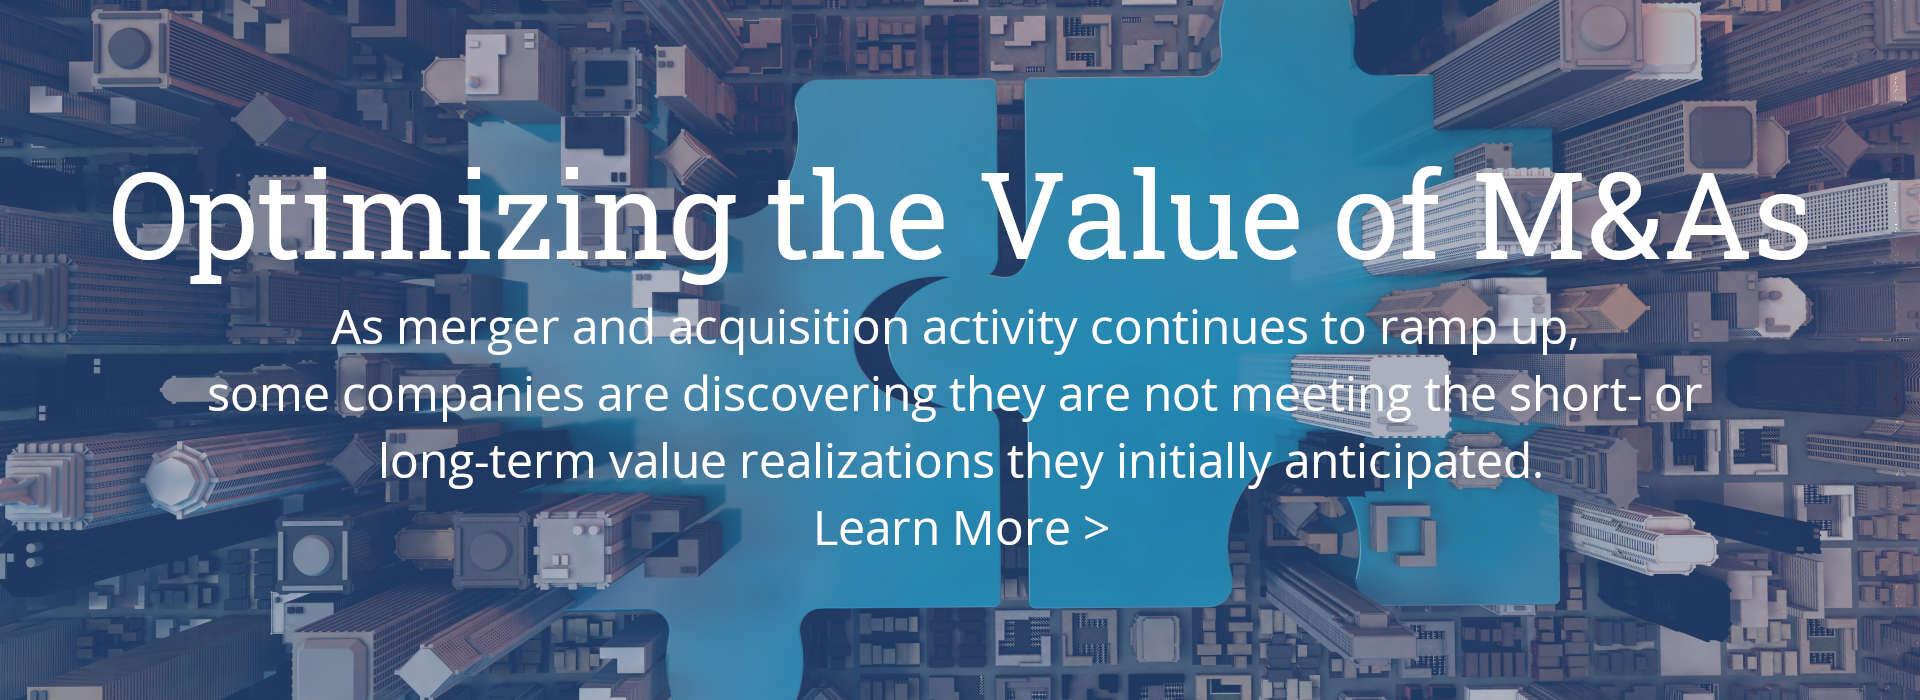 Optimizing-Value-M-A-home-carousel